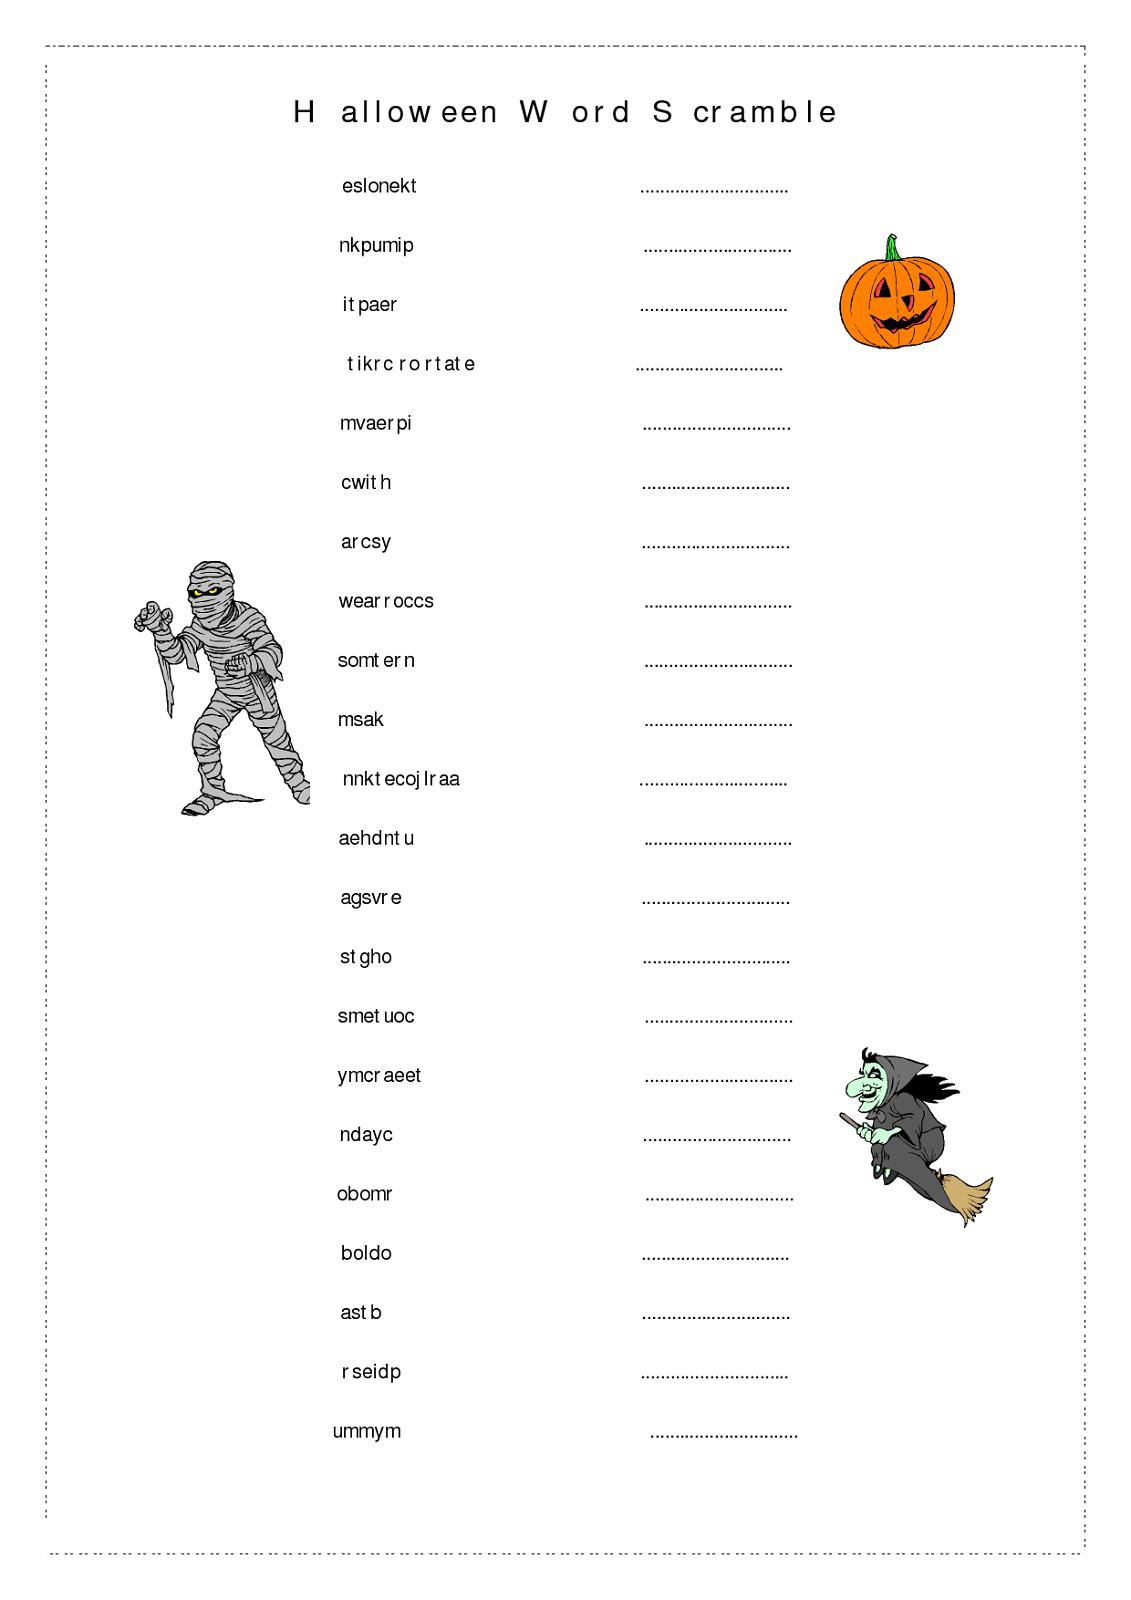 word-scramble-worksheet-halloween